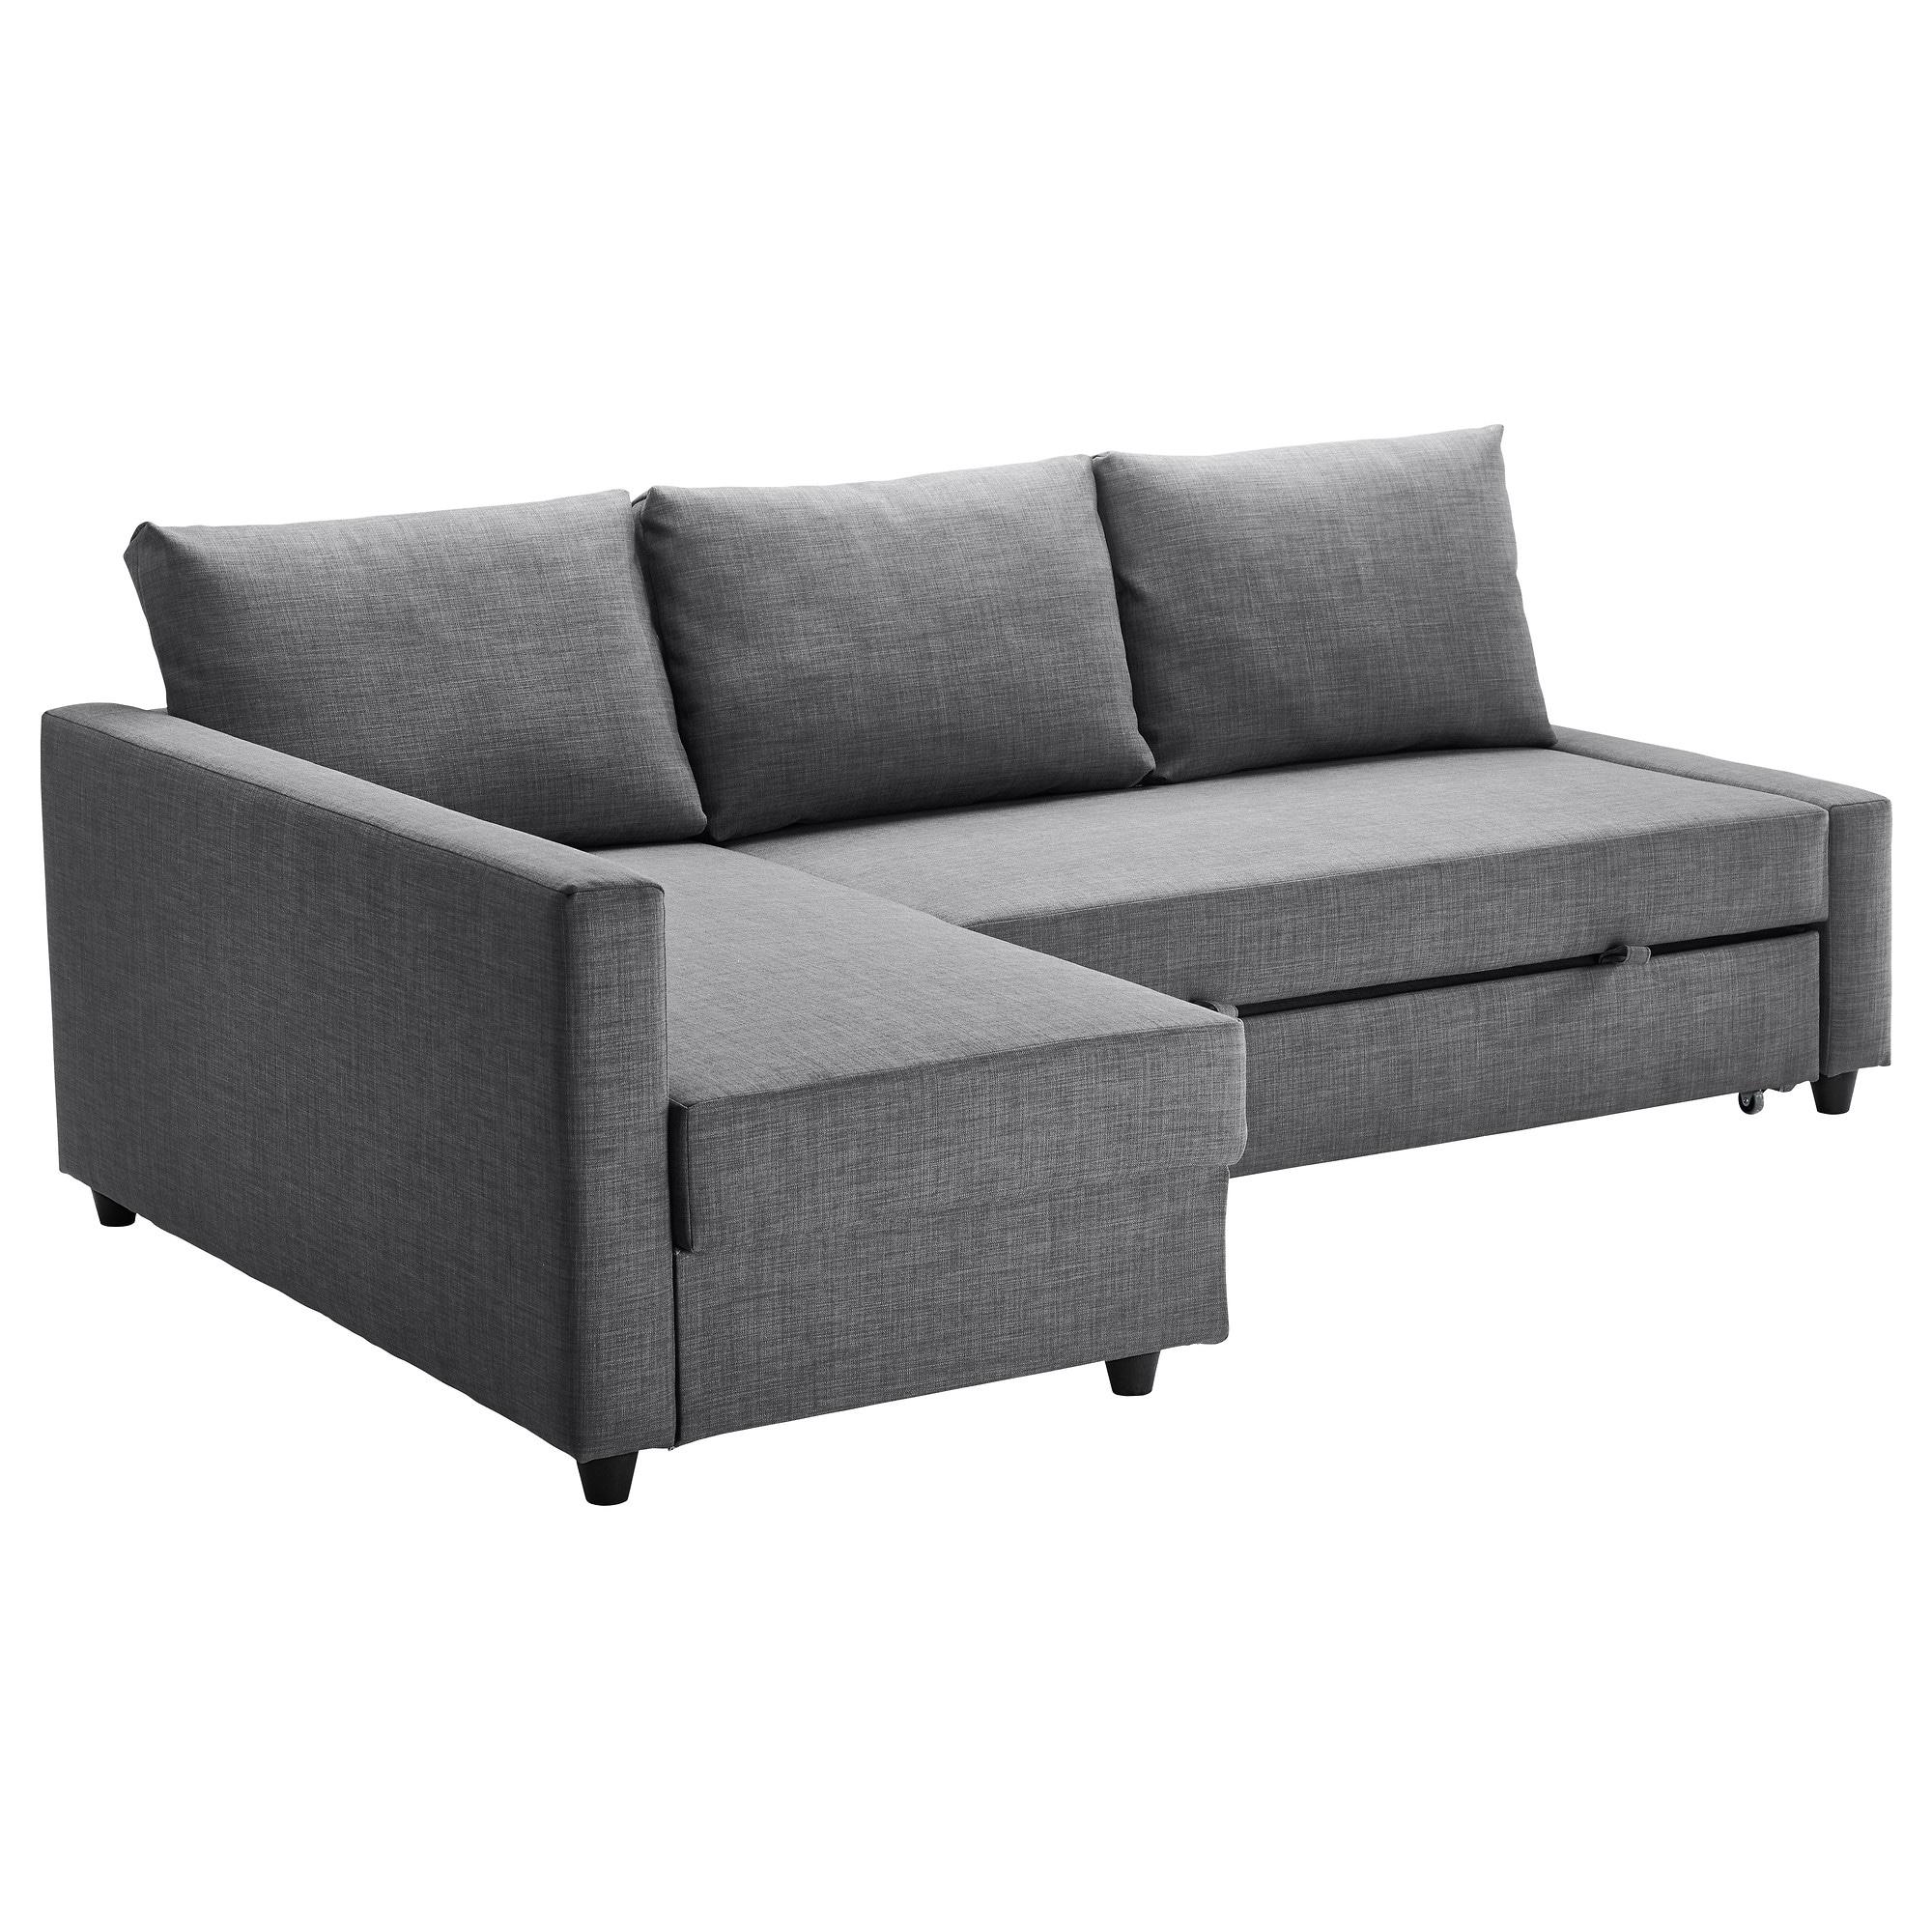 Sofa Llit Ikea 3id6 Friheten sofà Cama Esquina Con Almacenaje Skiftebo Gris Oscuro Ikea